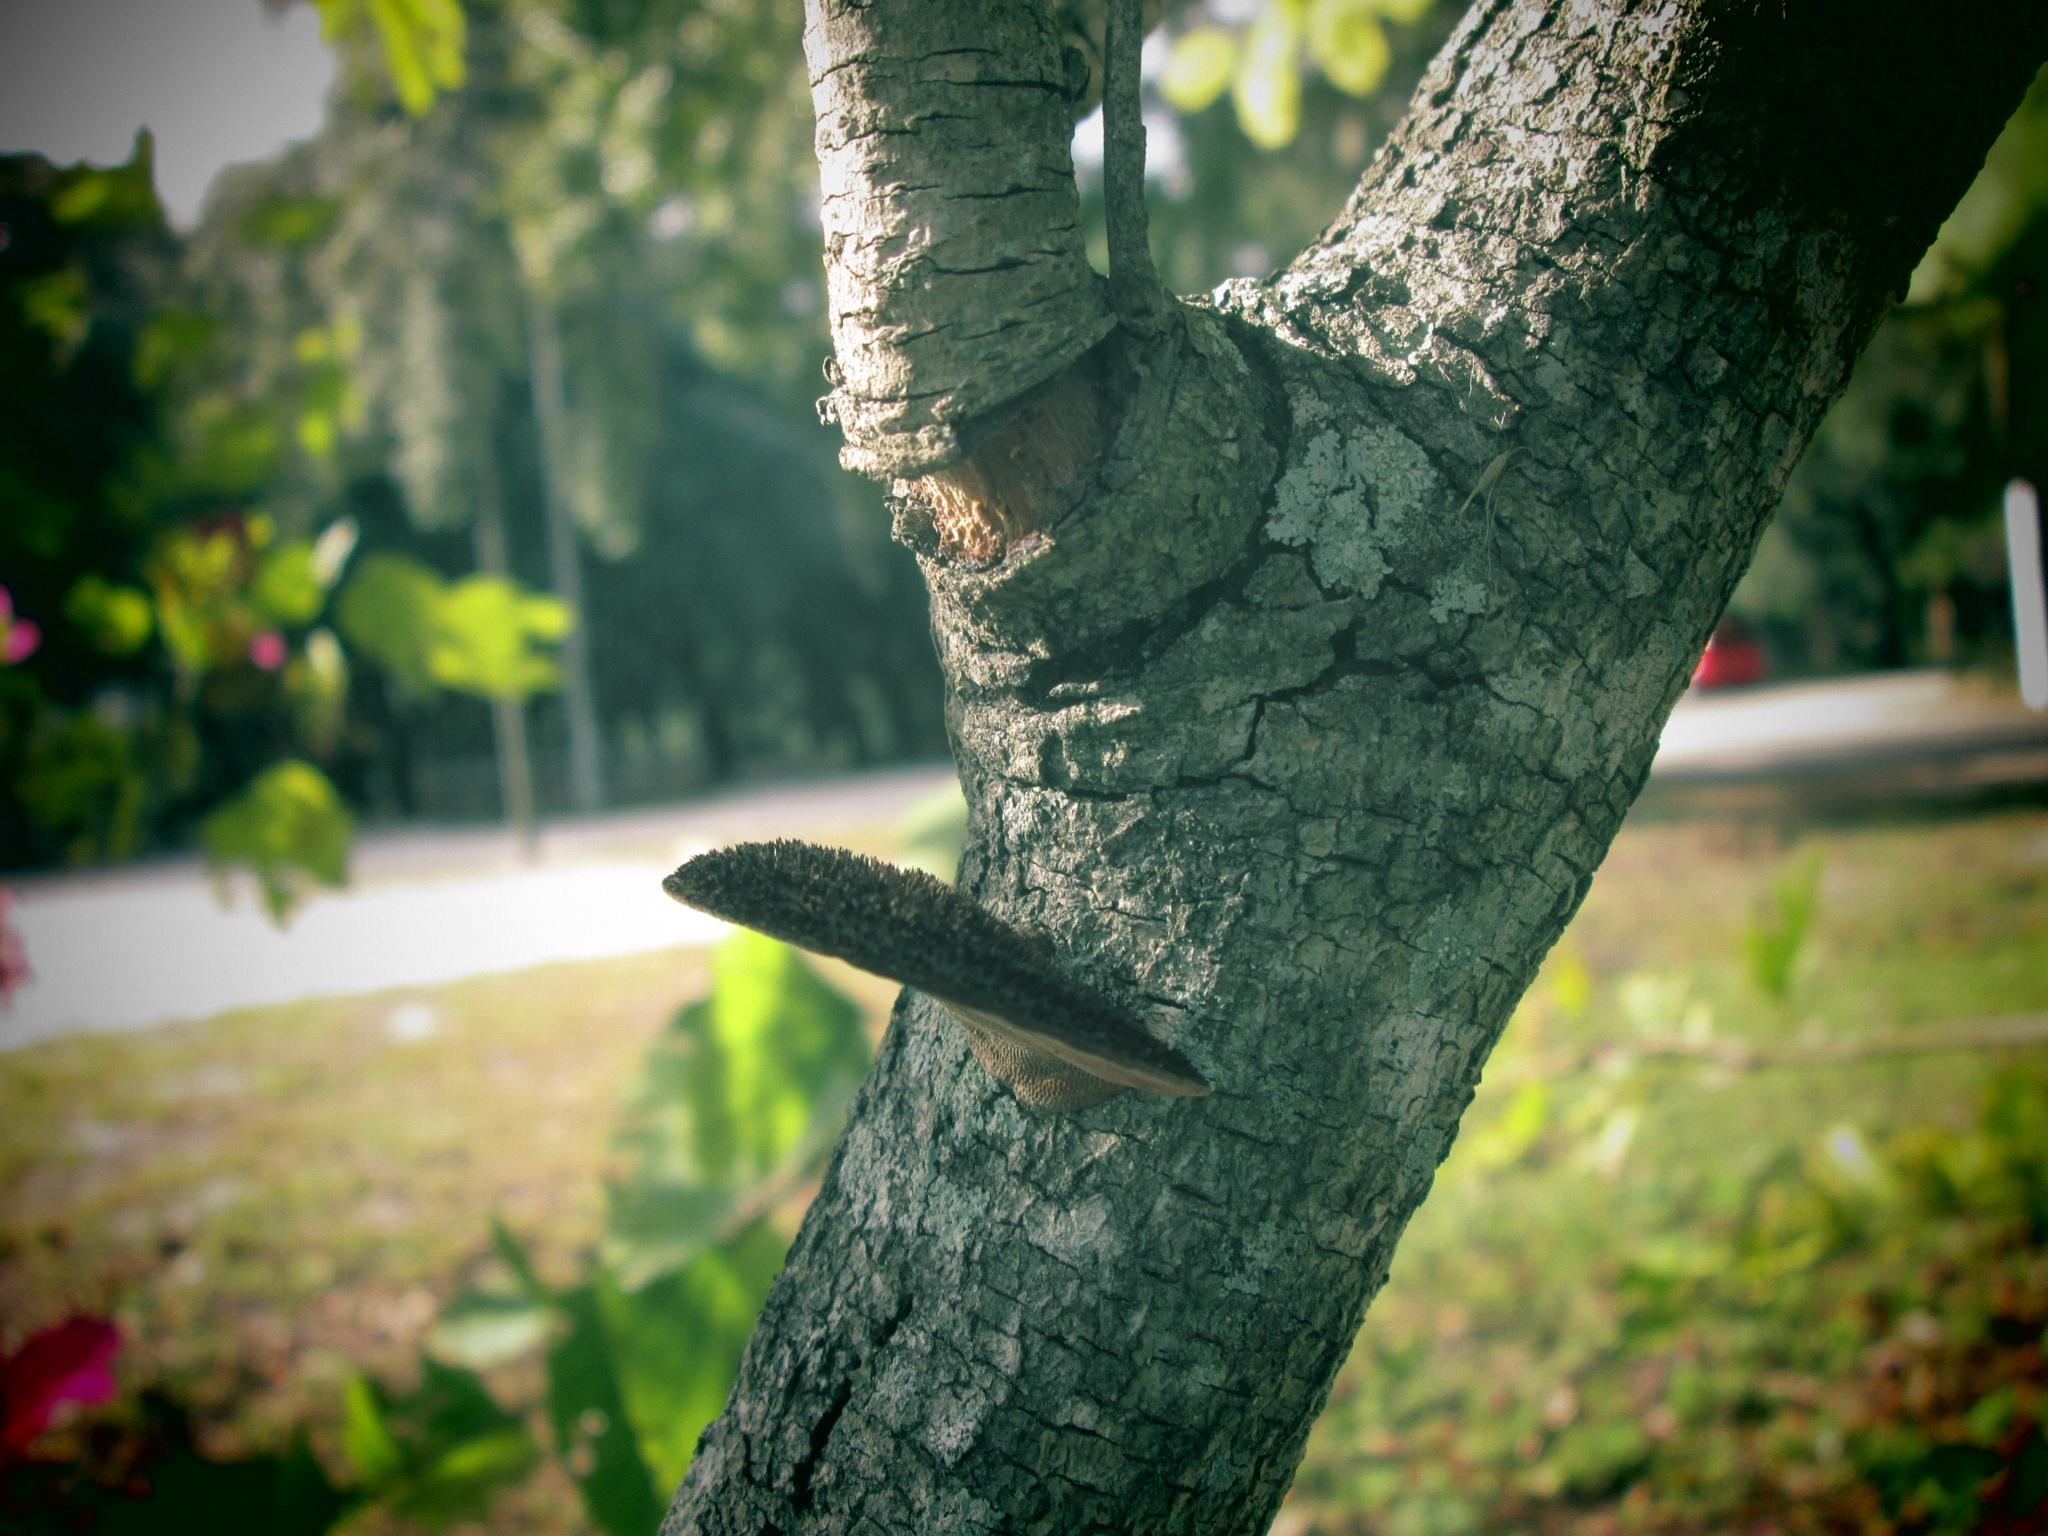 fungus by pamela.kanarr